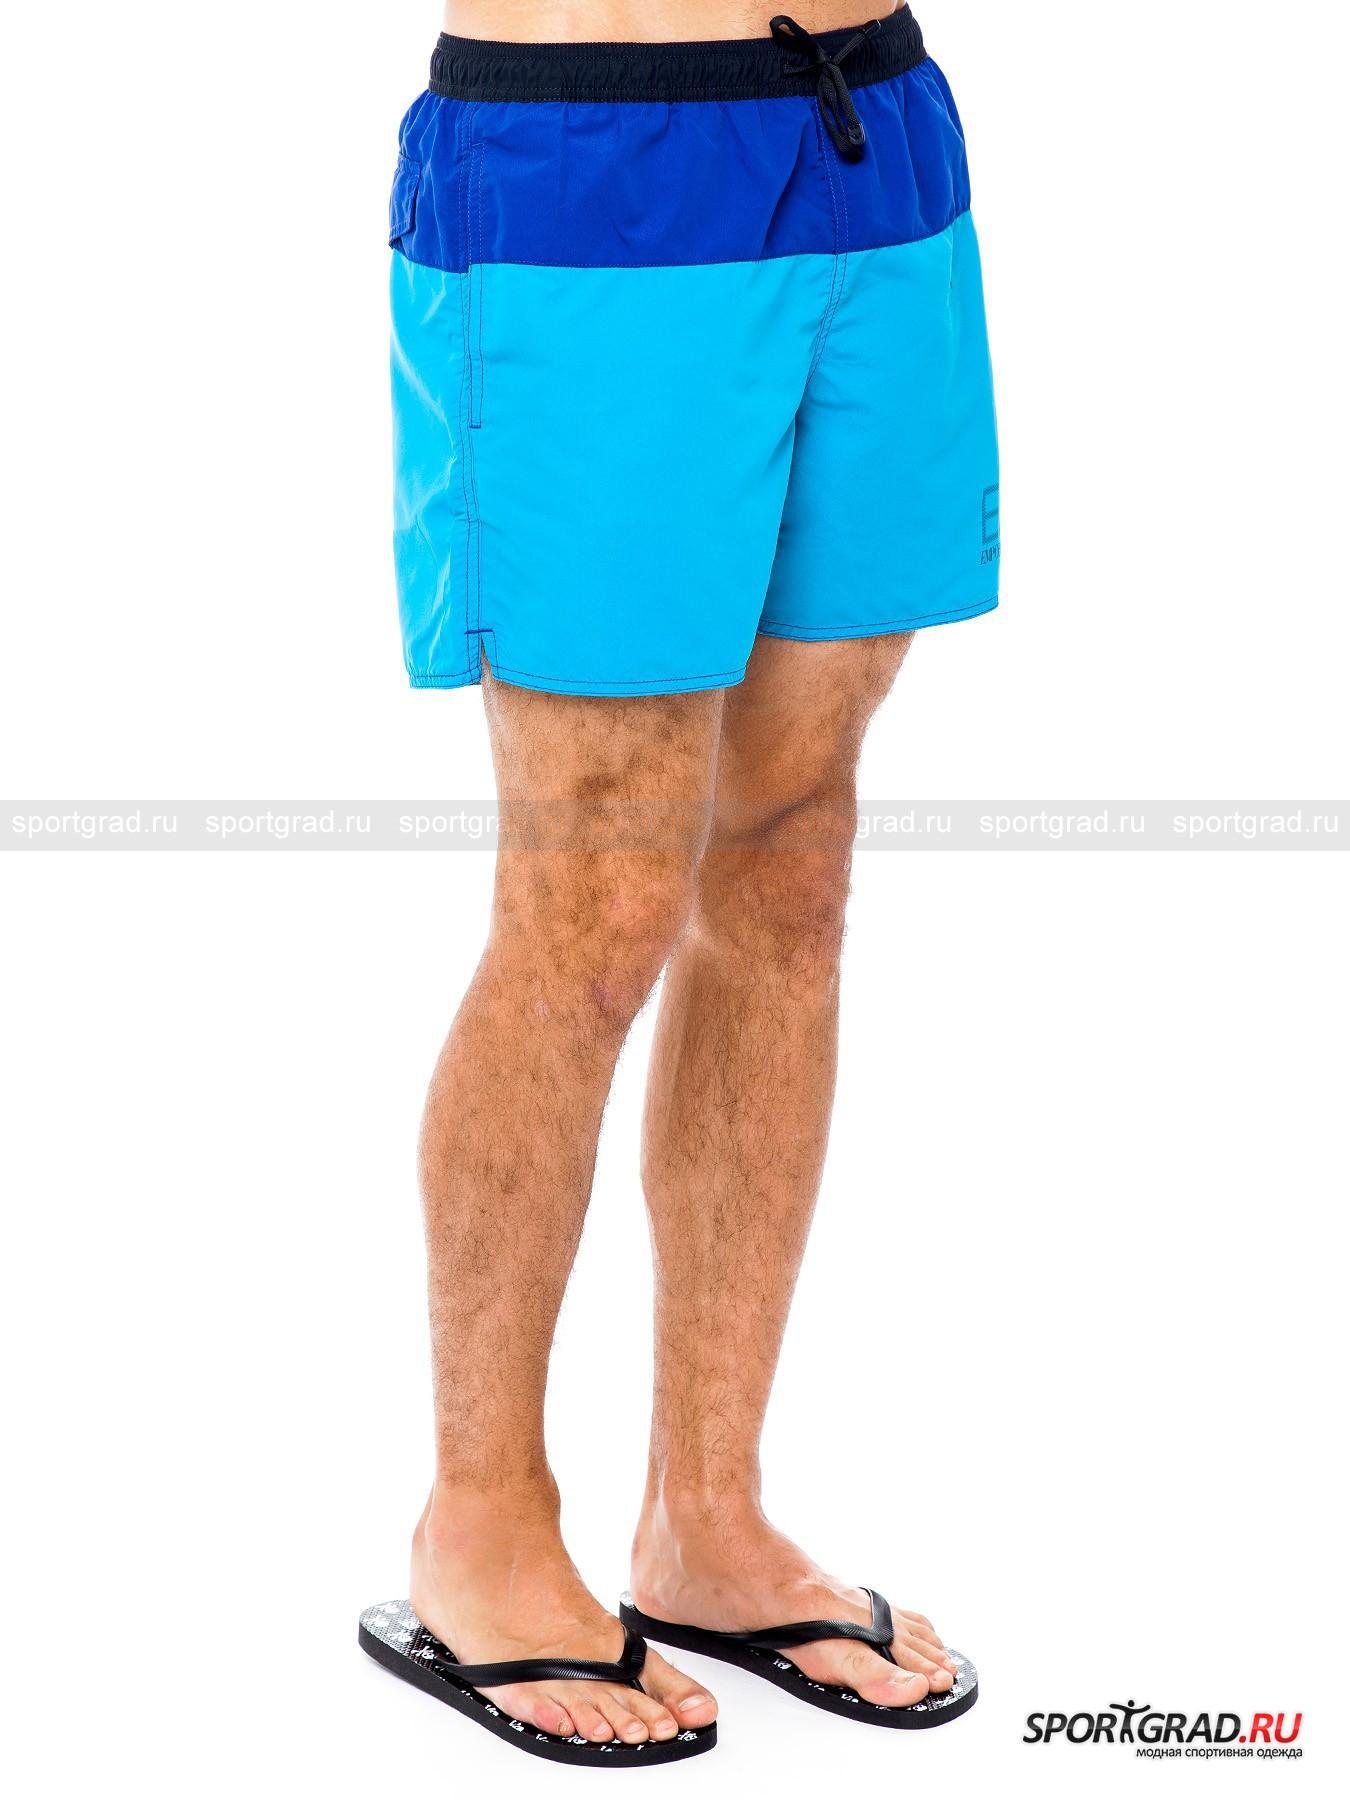 Шорты мужские пляжные Sea World Shaded Boxer EA7 Emporio Armani от Спортград